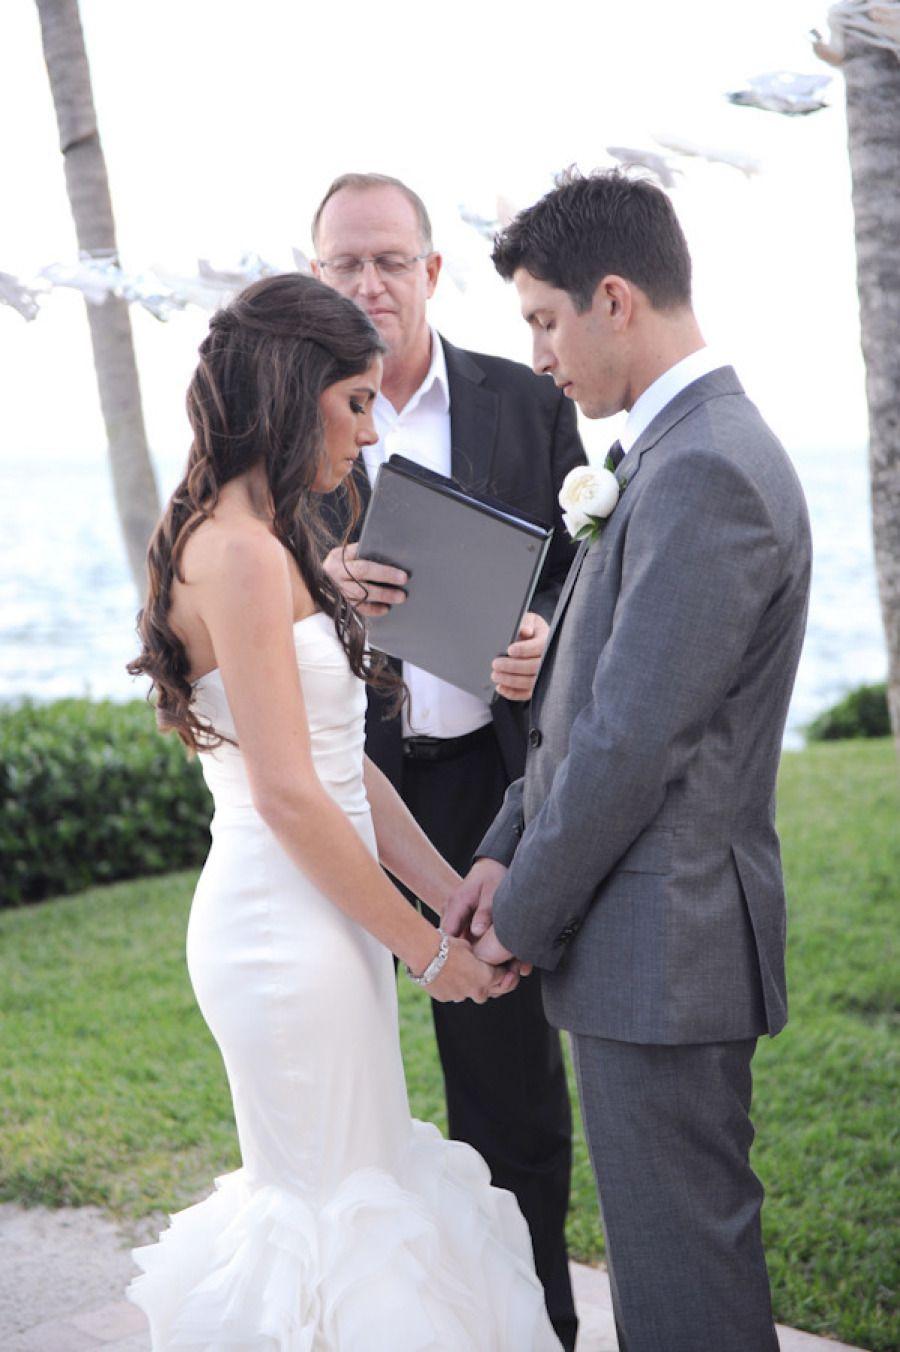 Miami wedding at grove isle from lara rios fine art